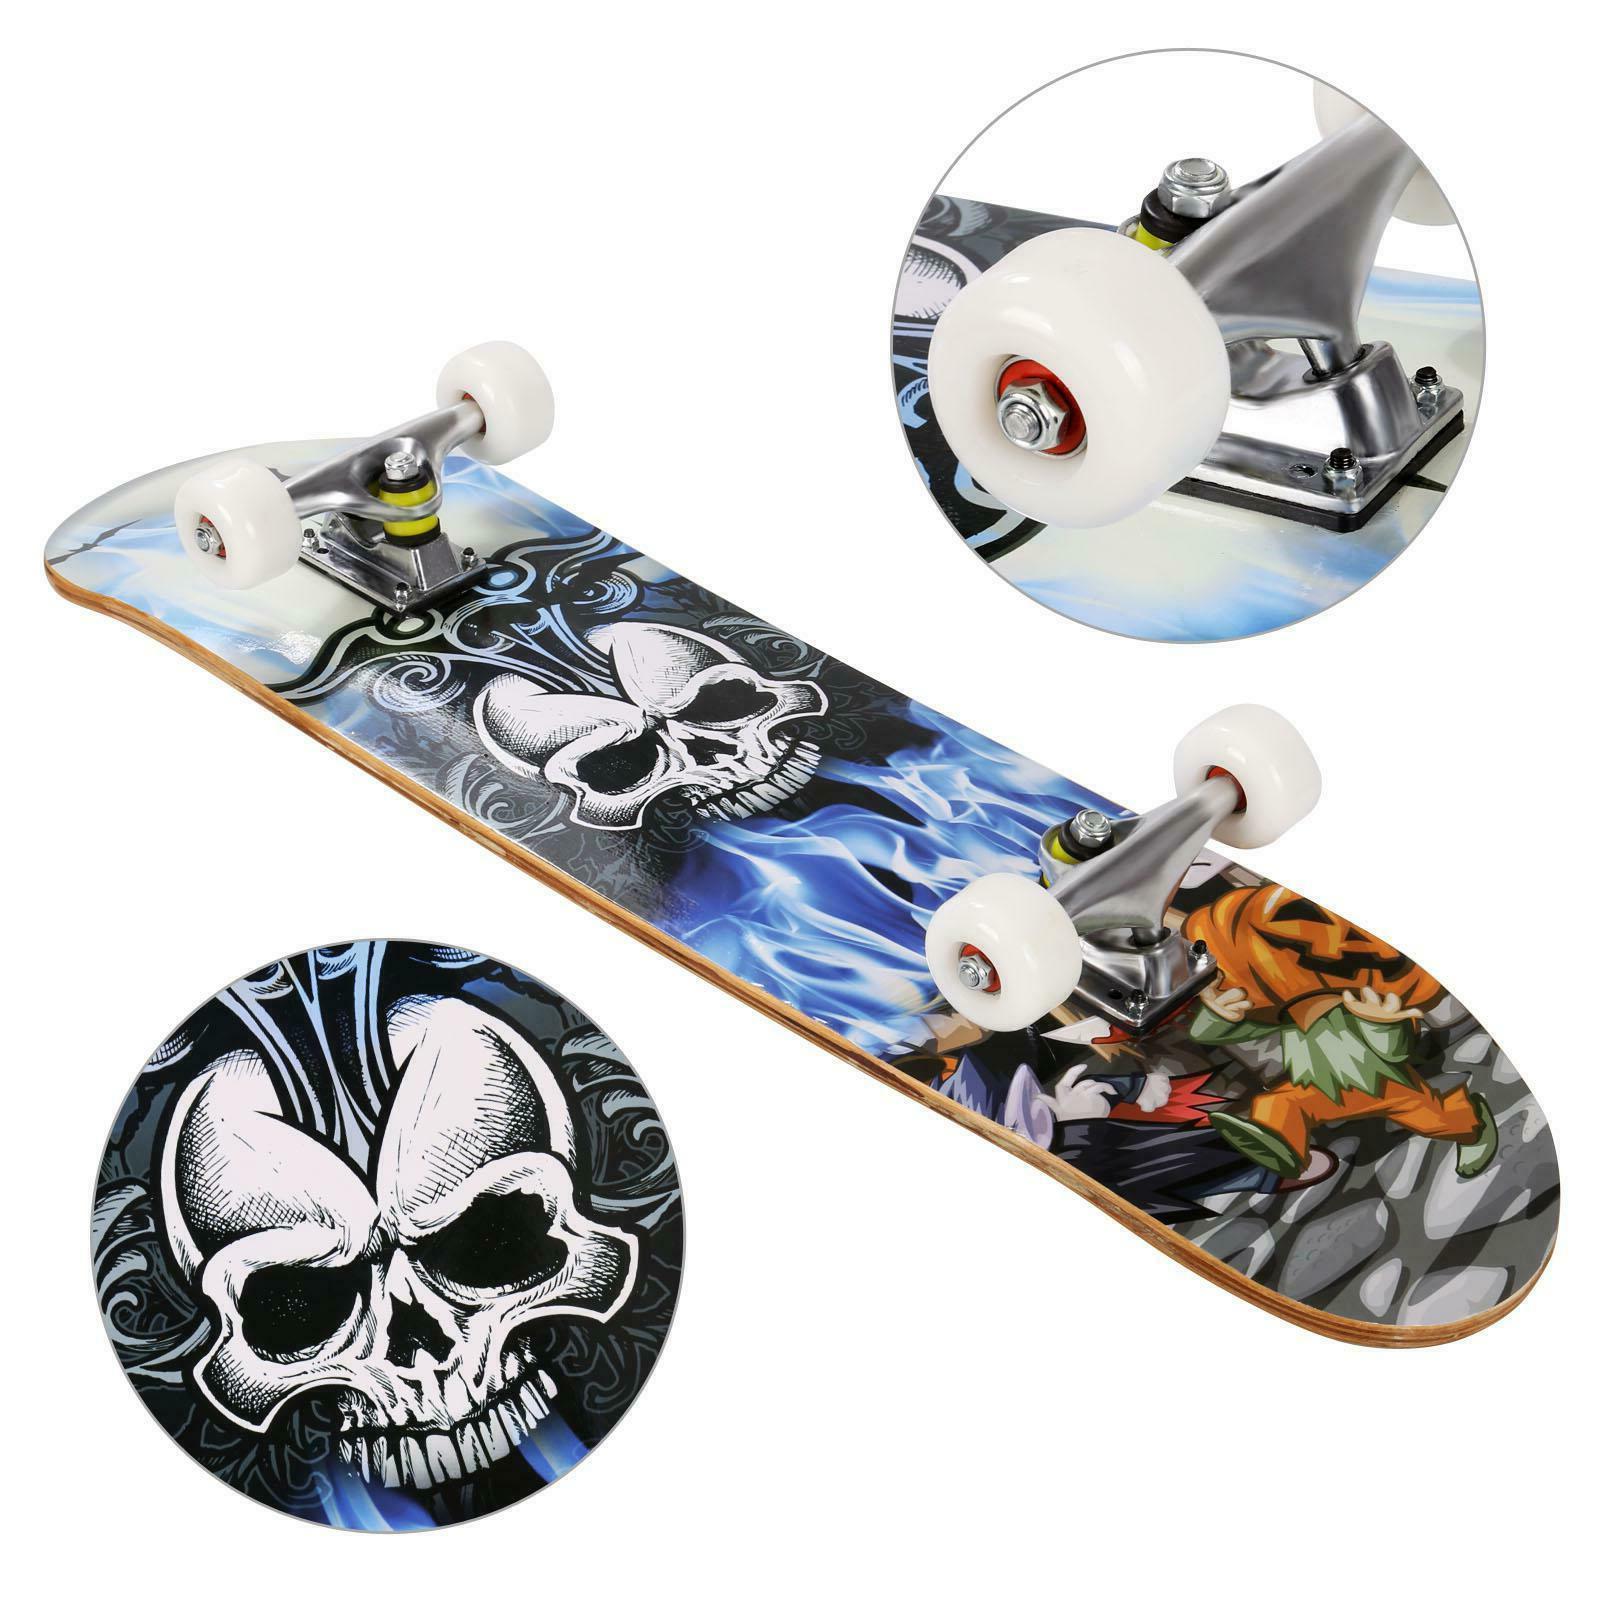 22/26/31In for Complete Skateboard Maple Gift